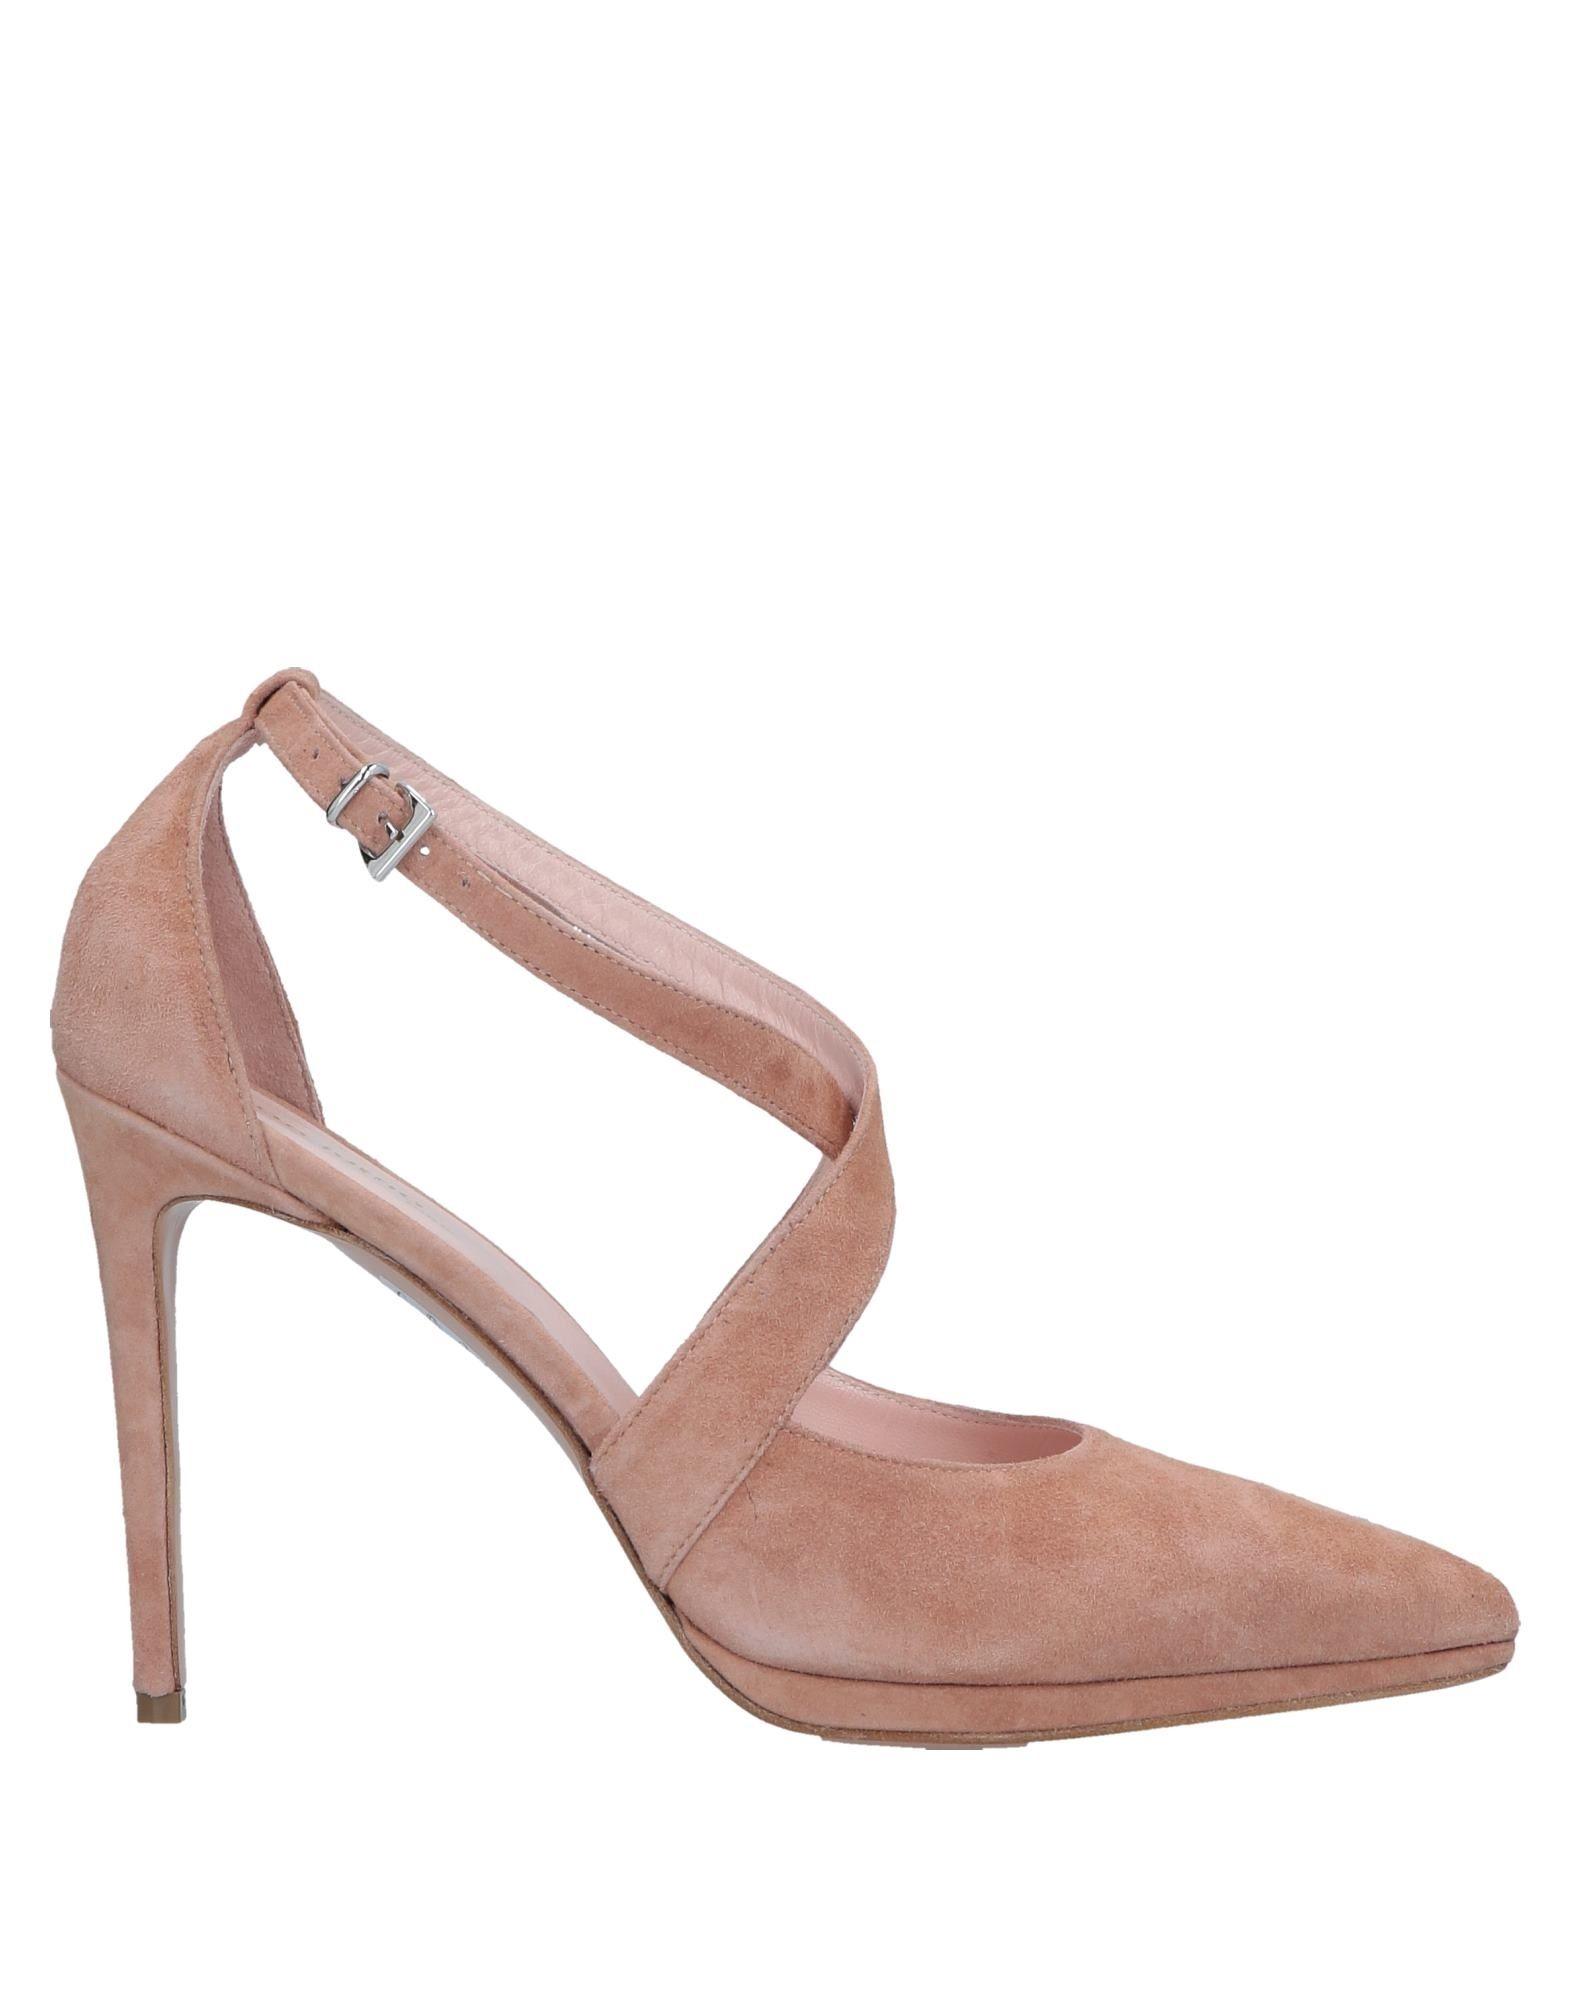 ALAN JURNO Туфли цены онлайн